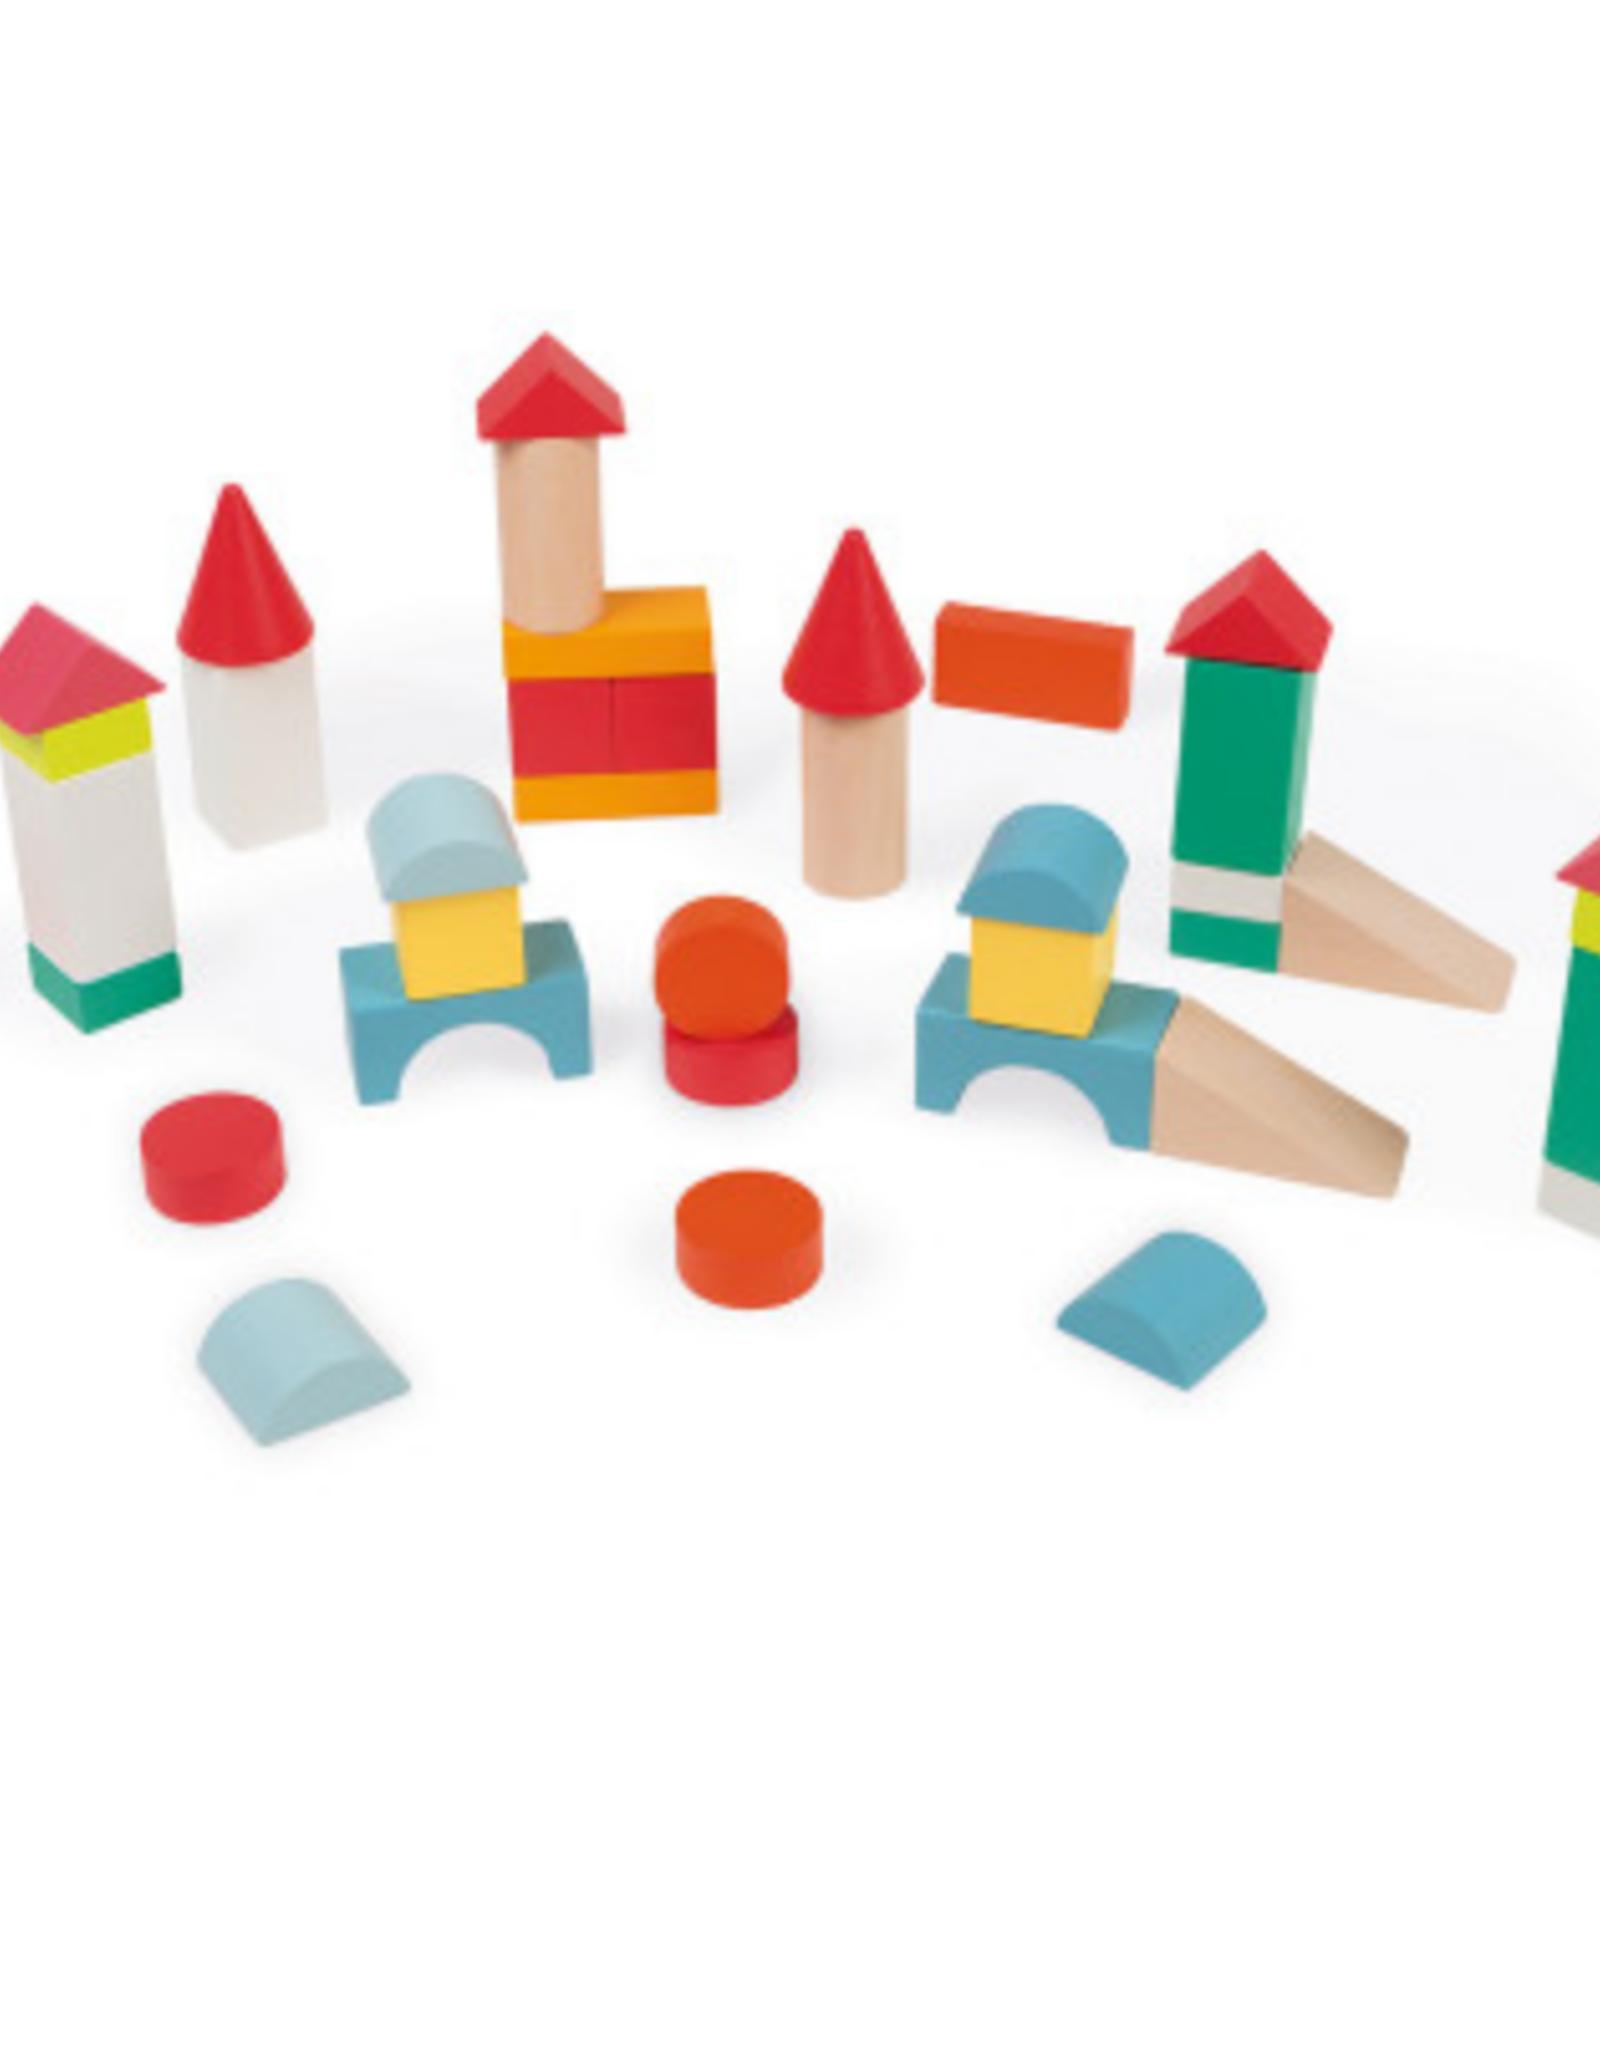 Kubix 40 Blocks